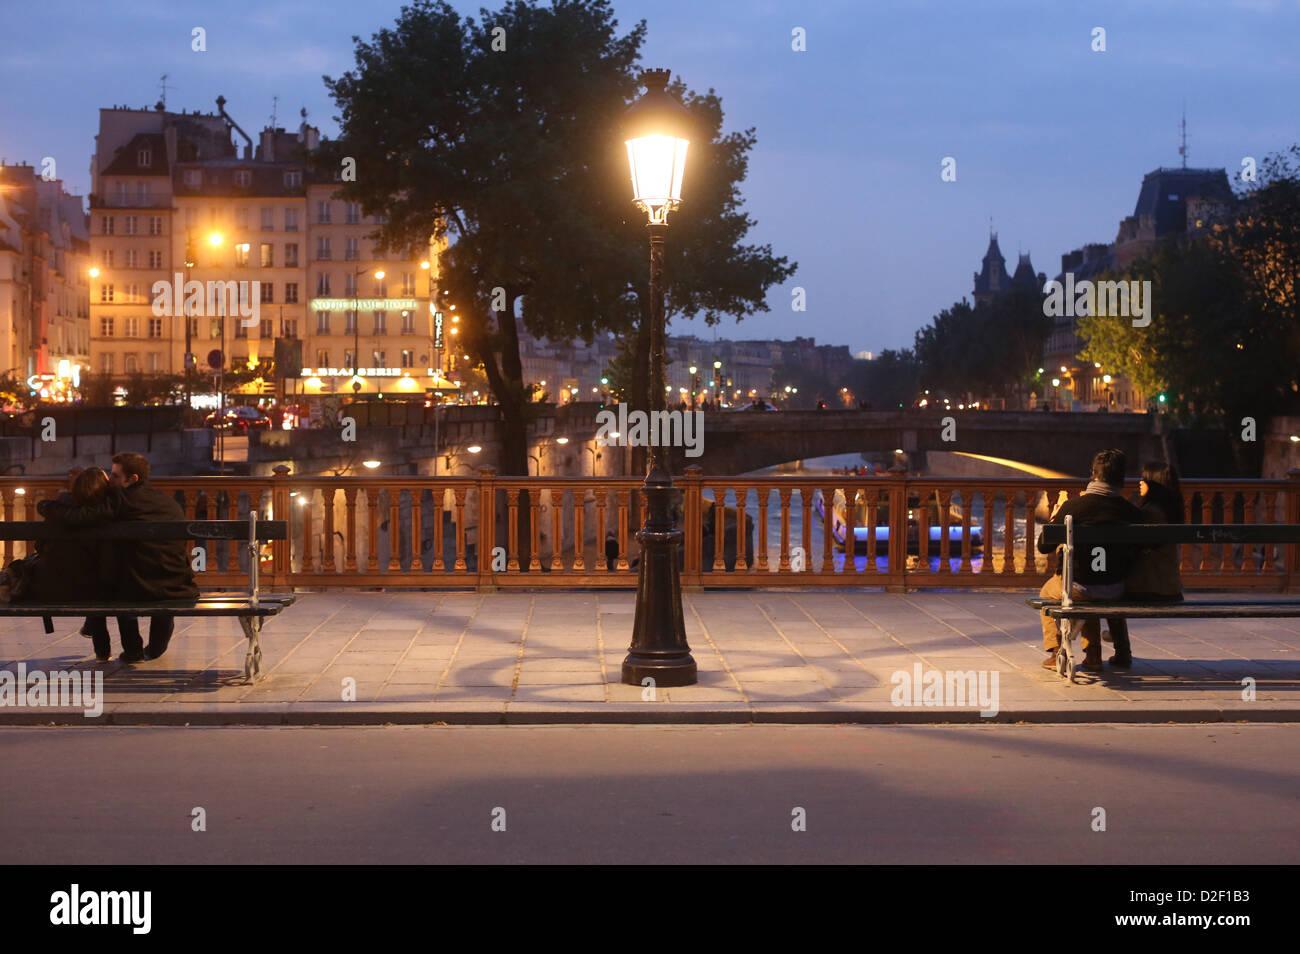 Pont au Double at night. Paris. France. - Stock Image